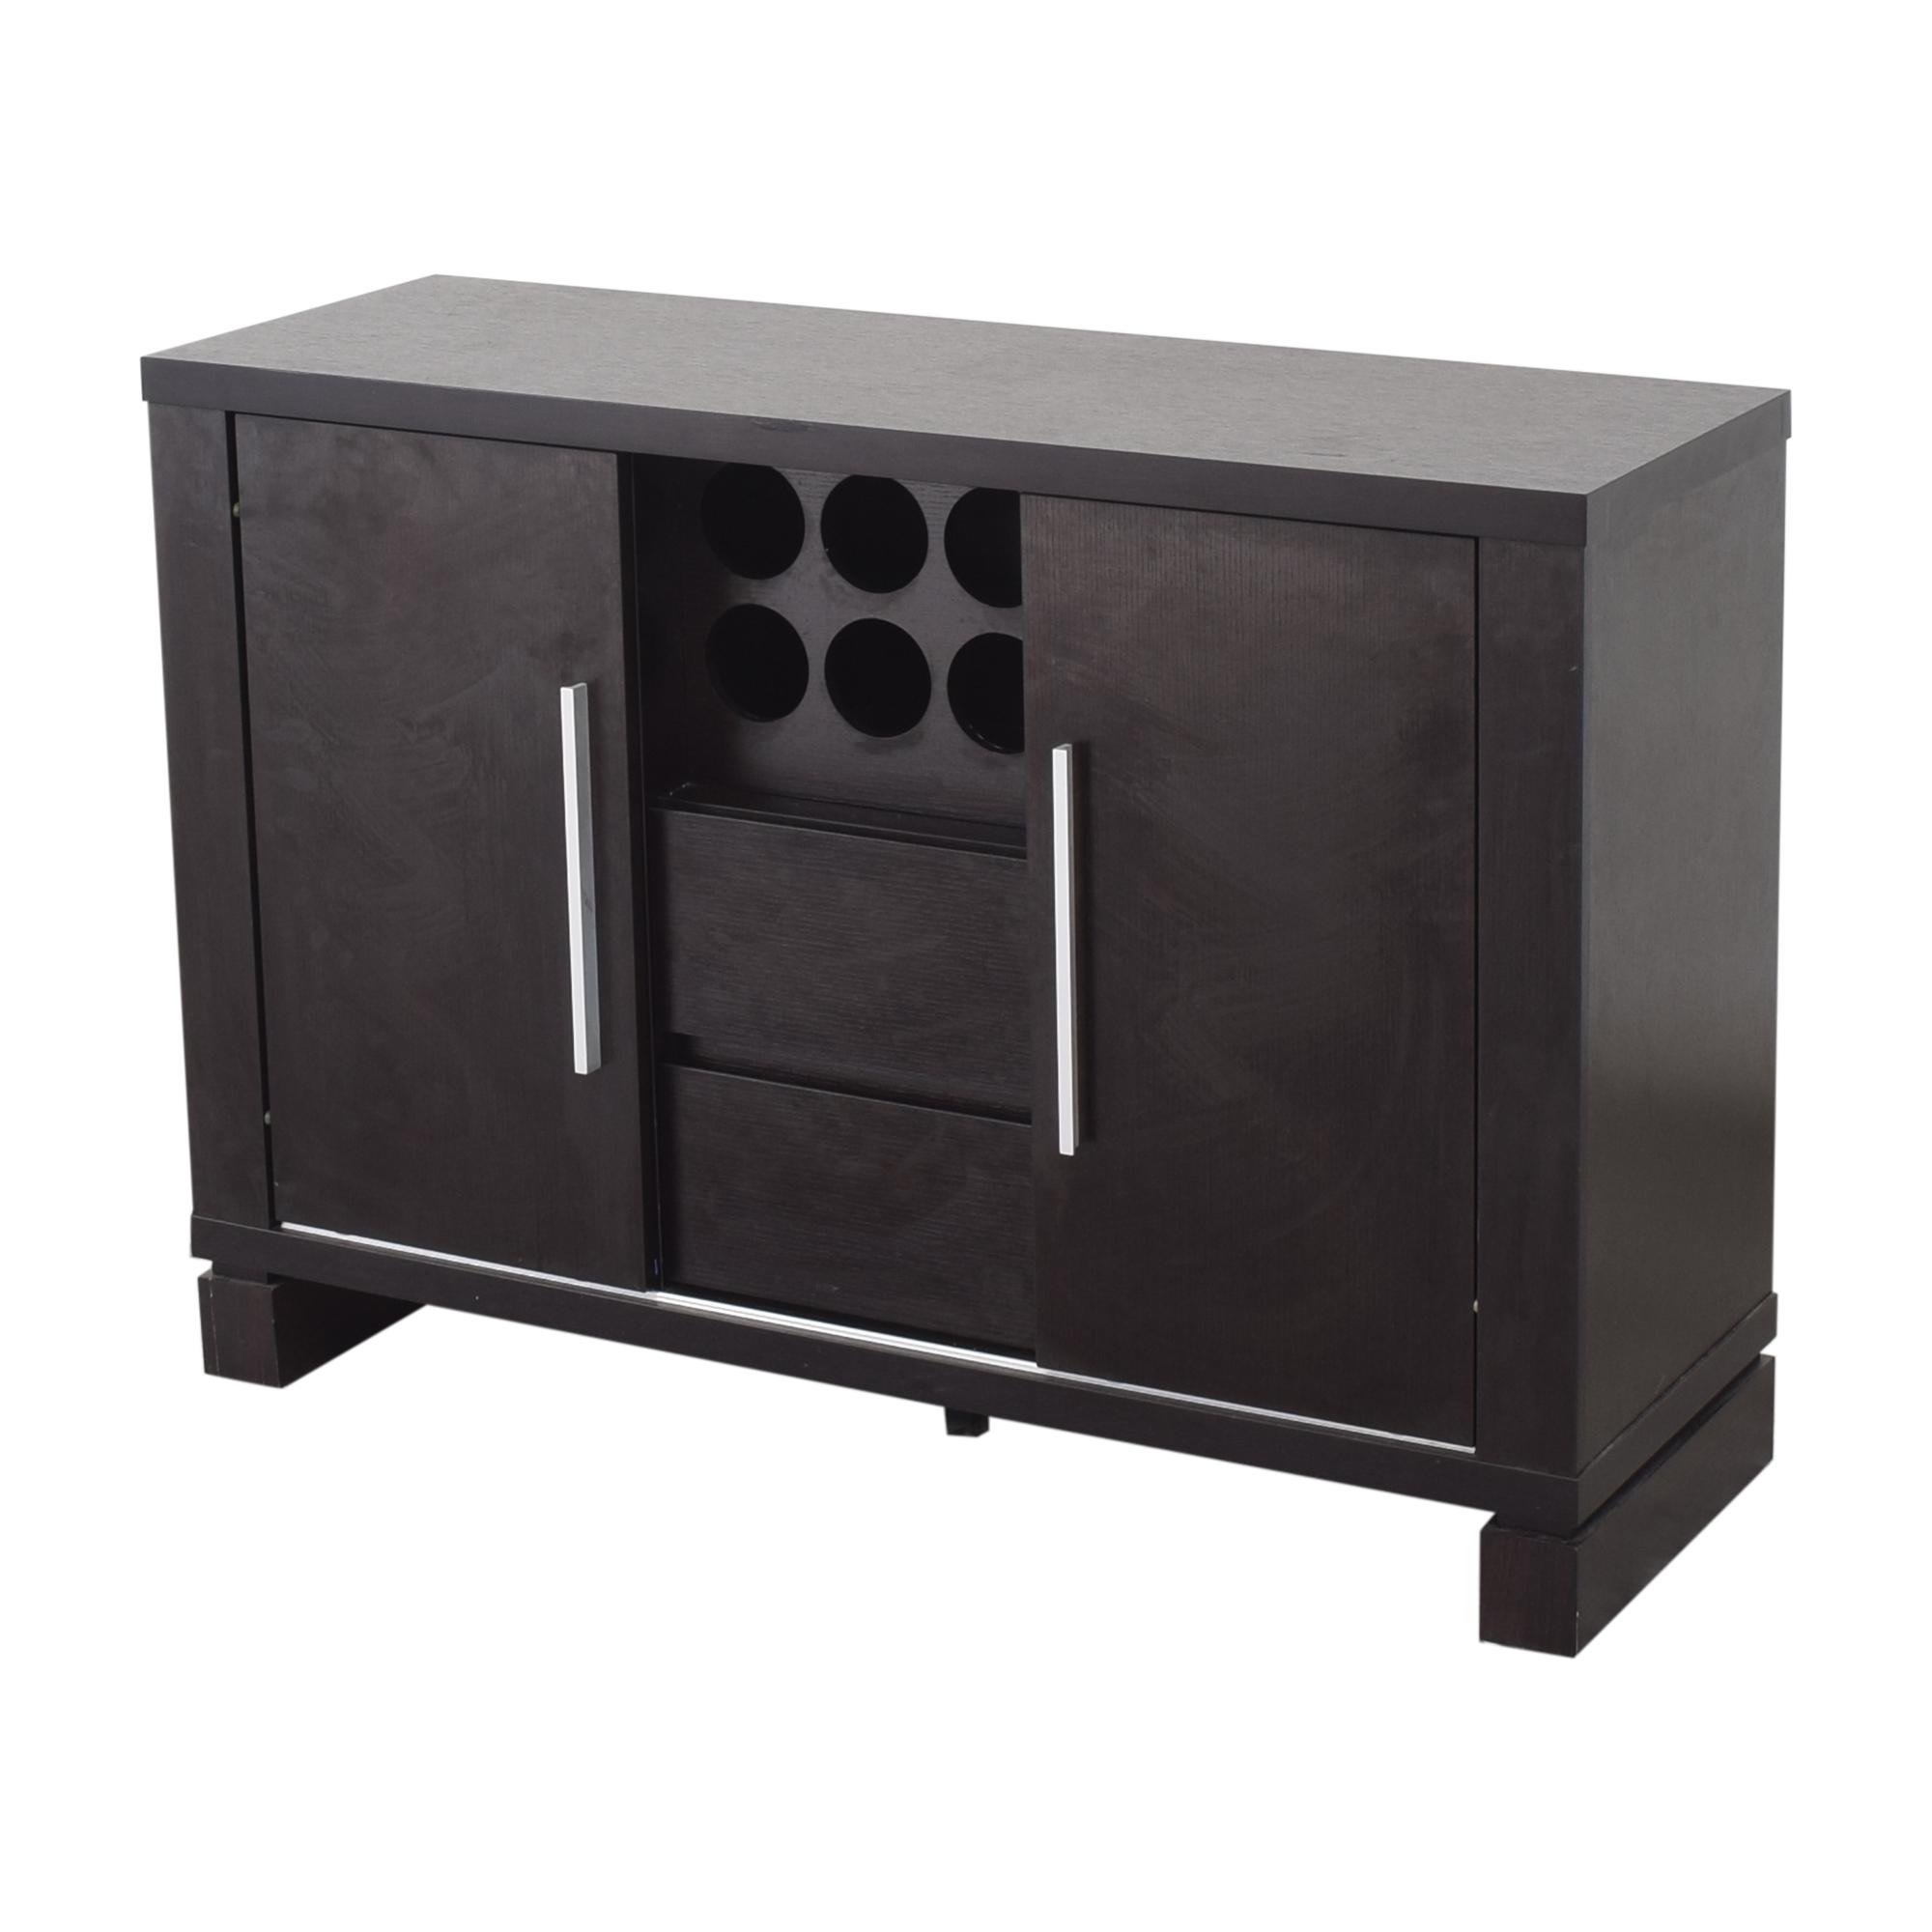 Wayfair Wayfair Wine Bar Cabinet dimensions